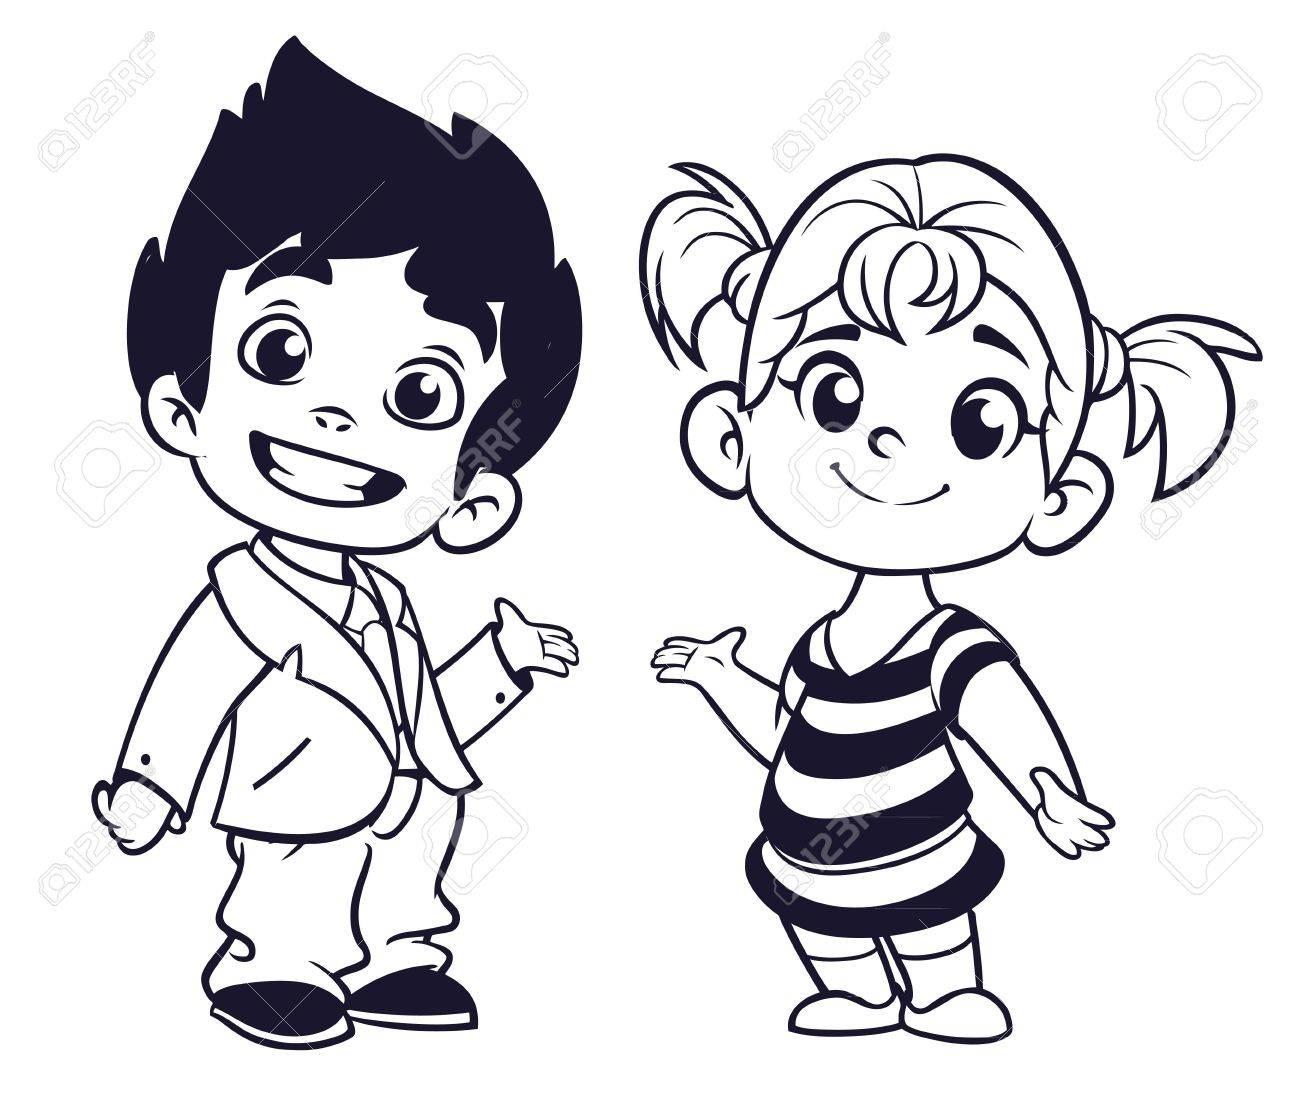 Preschool clipart hand, Preschool hand Transparent FREE for download on  WebStockReview 2020